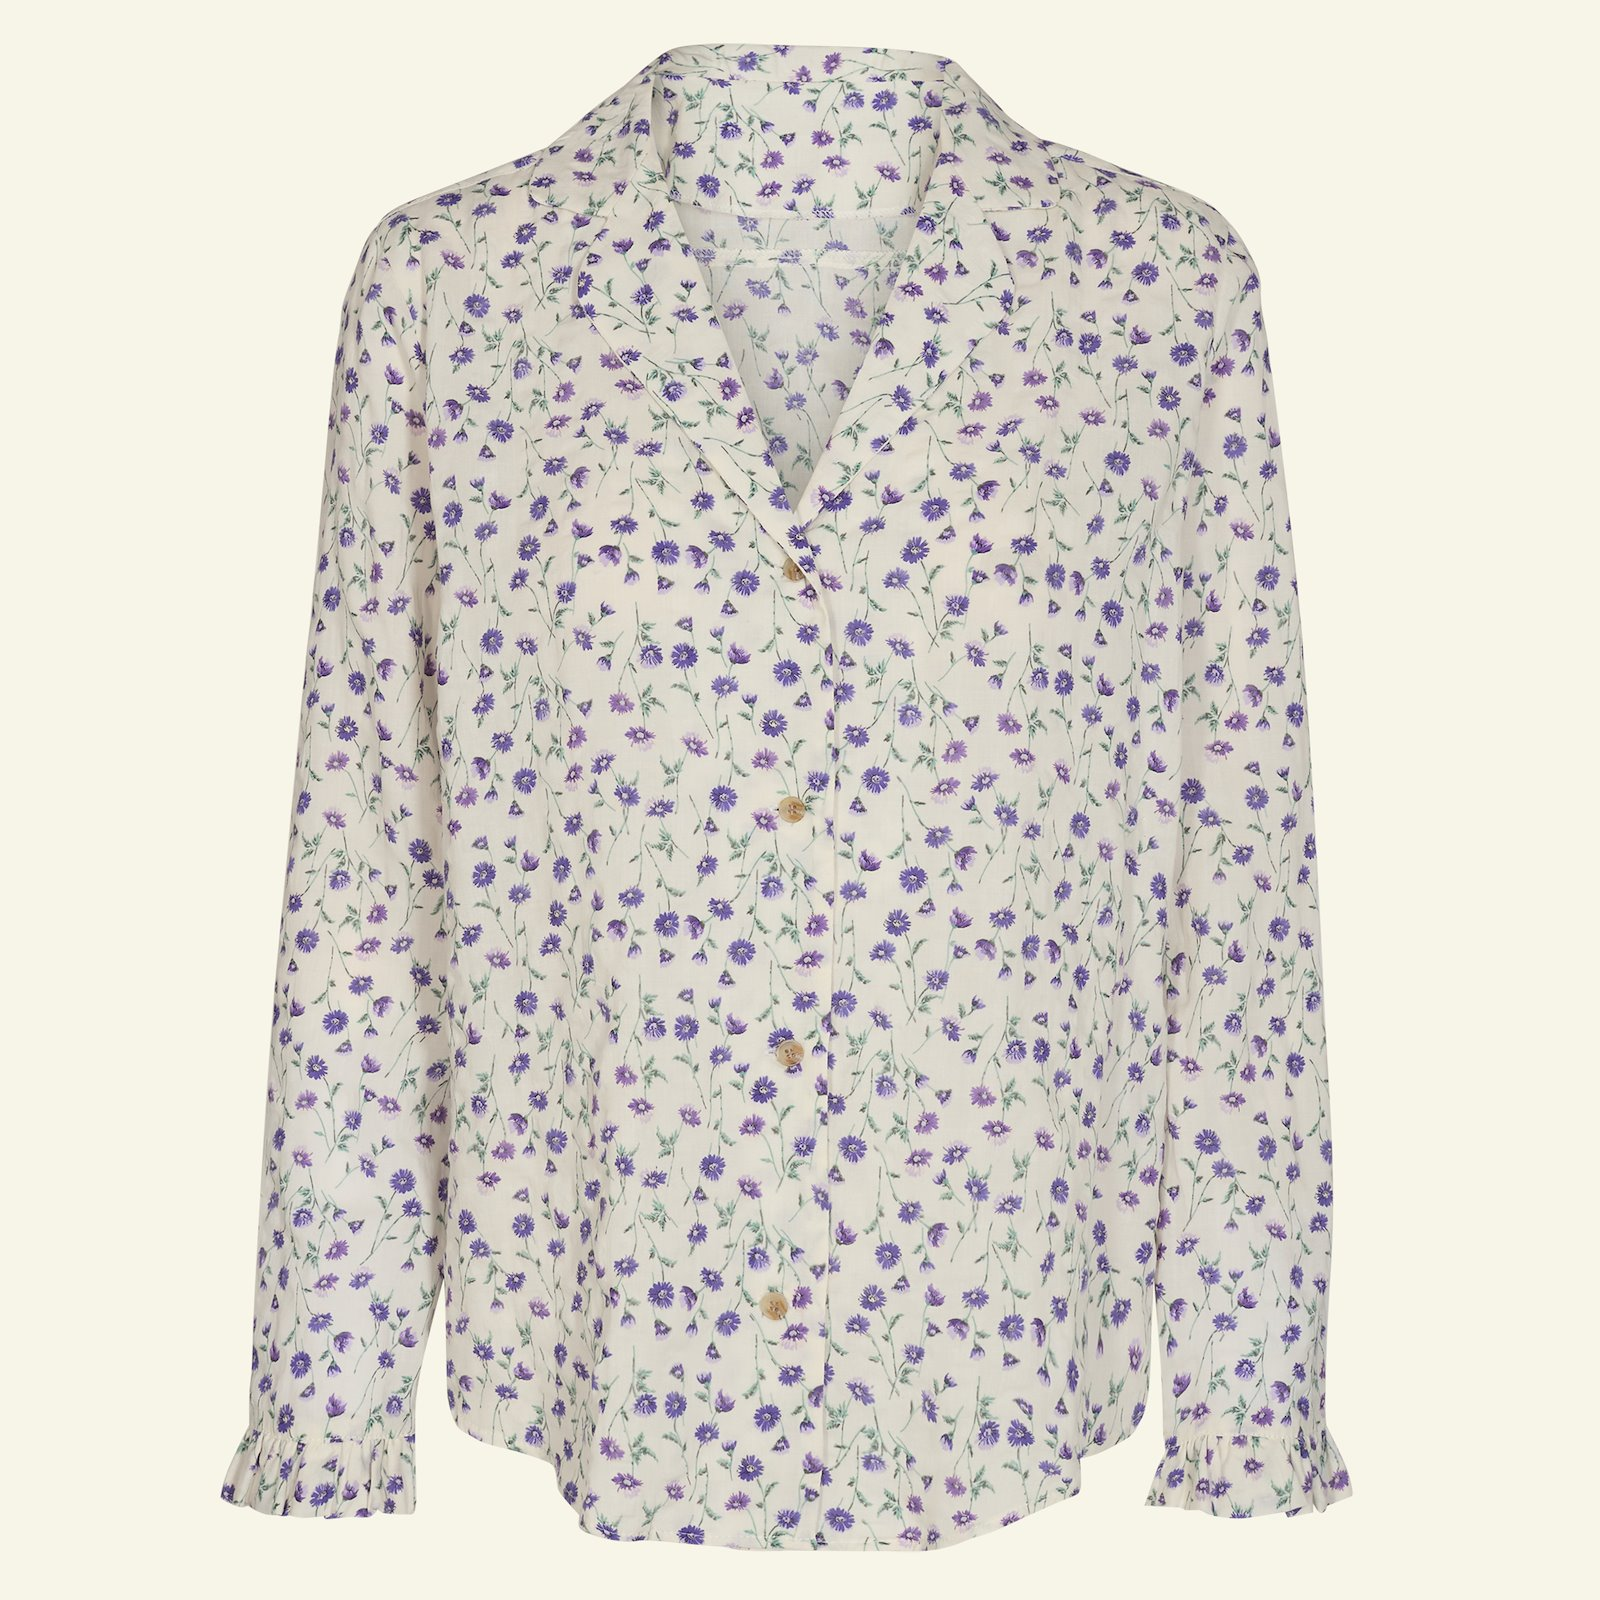 Shirt with ¾ sleeve length, 46/18 p22058_580051_40228_sskit